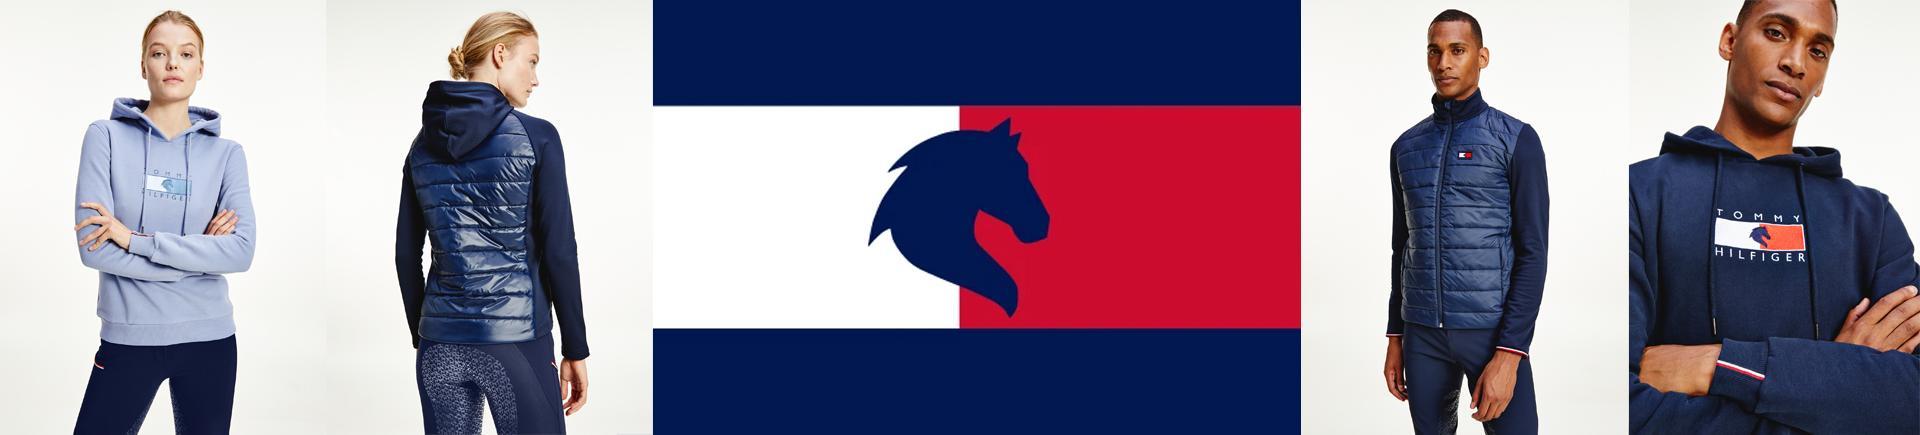 Tommy Hilfiger Equestrian 2021 wintercollectie